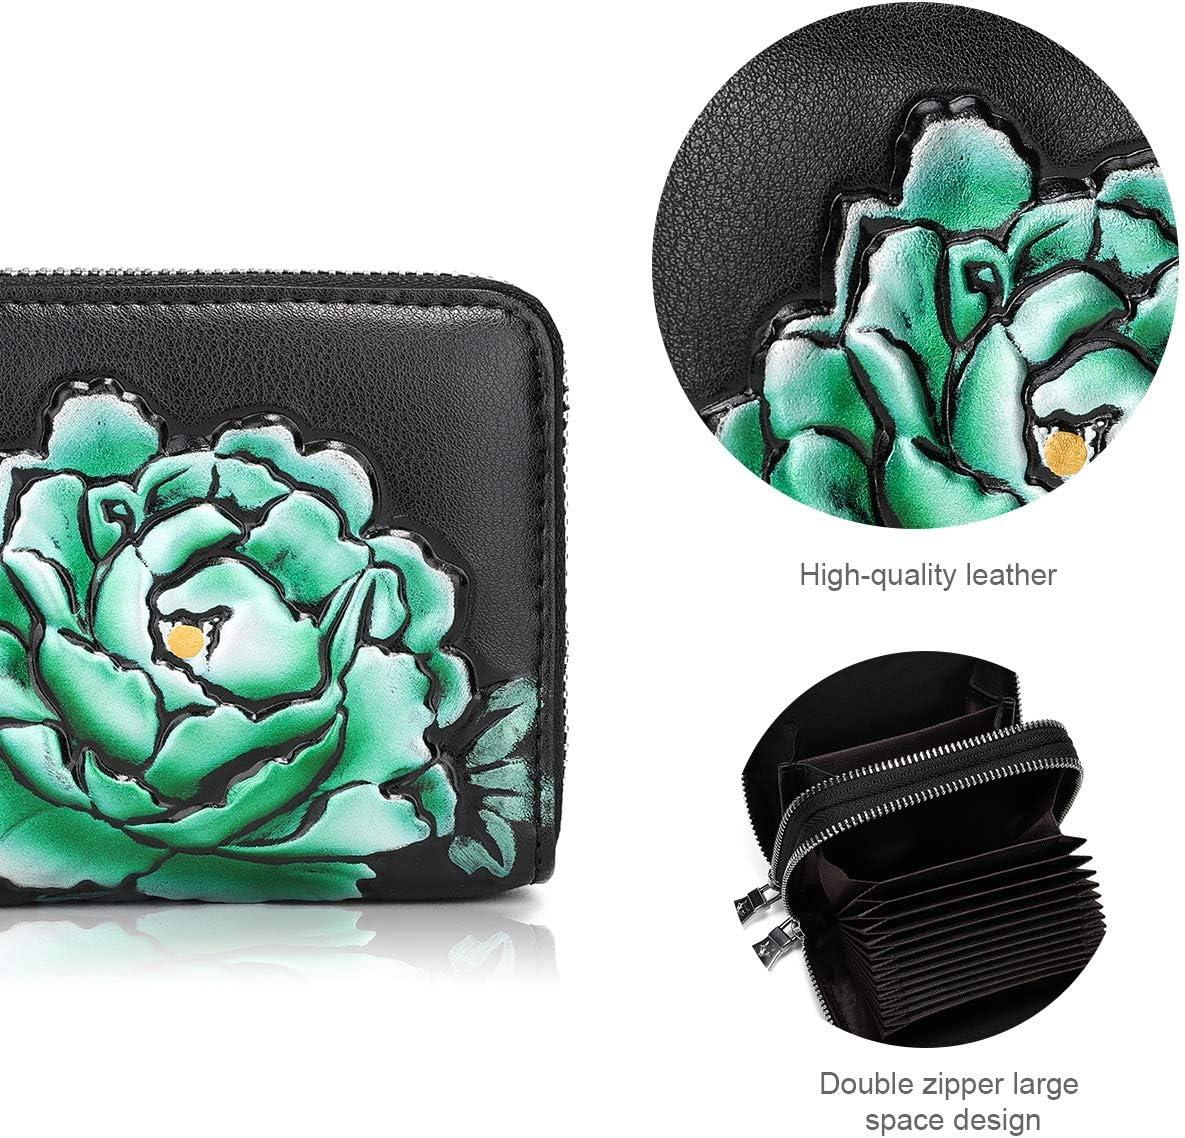 3257-BLACK YOVIEE RFID Wallets for Women Business Credit Card Case Money Organizer Purse Double Zipper